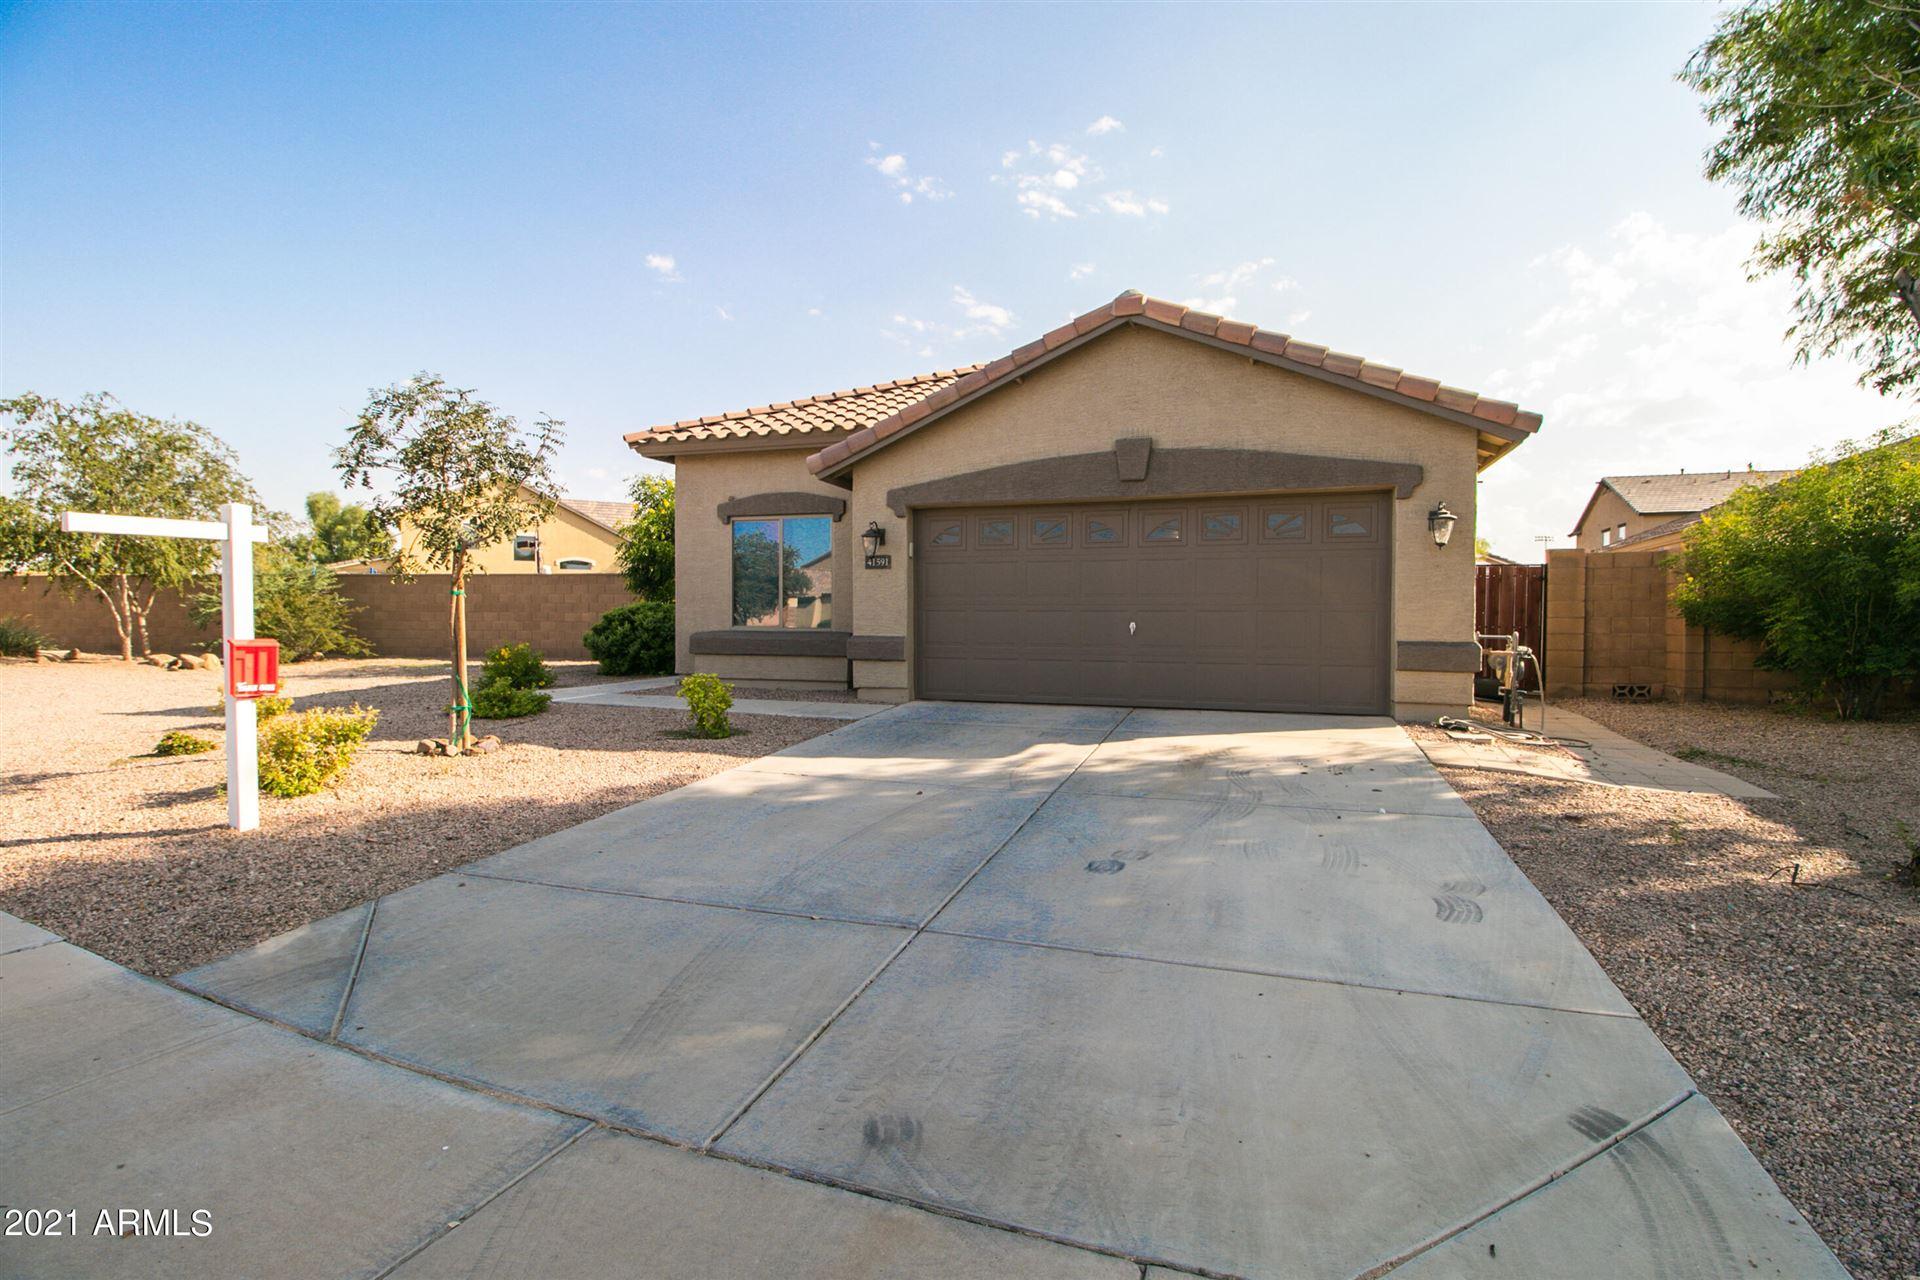 Photo for 41591 W CORVALIS Lane W, Maricopa, AZ 85138 (MLS # 6292884)